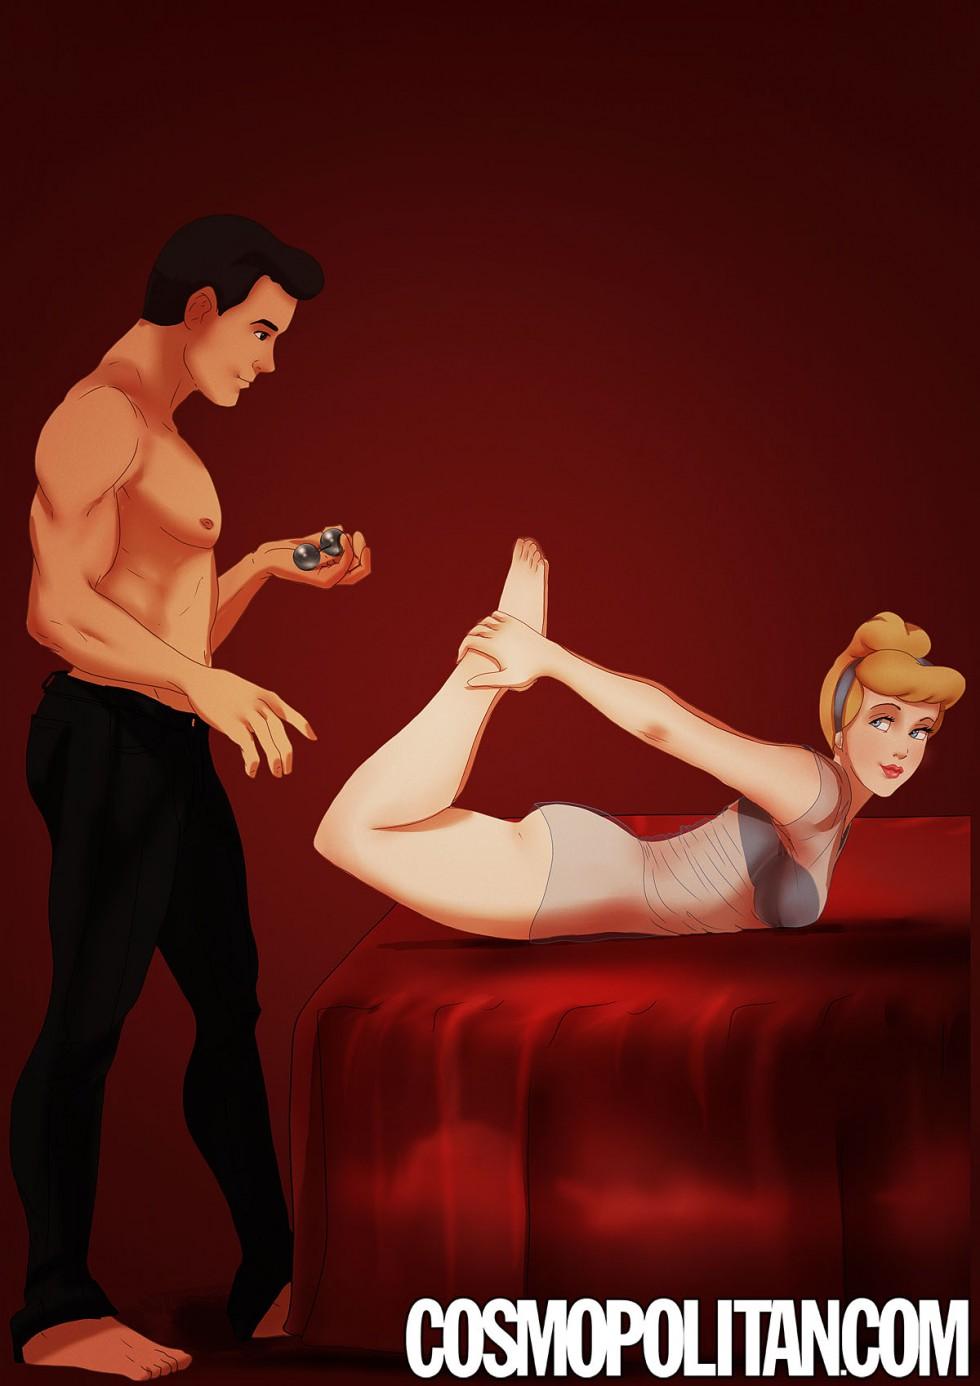 Princes porn erotic images